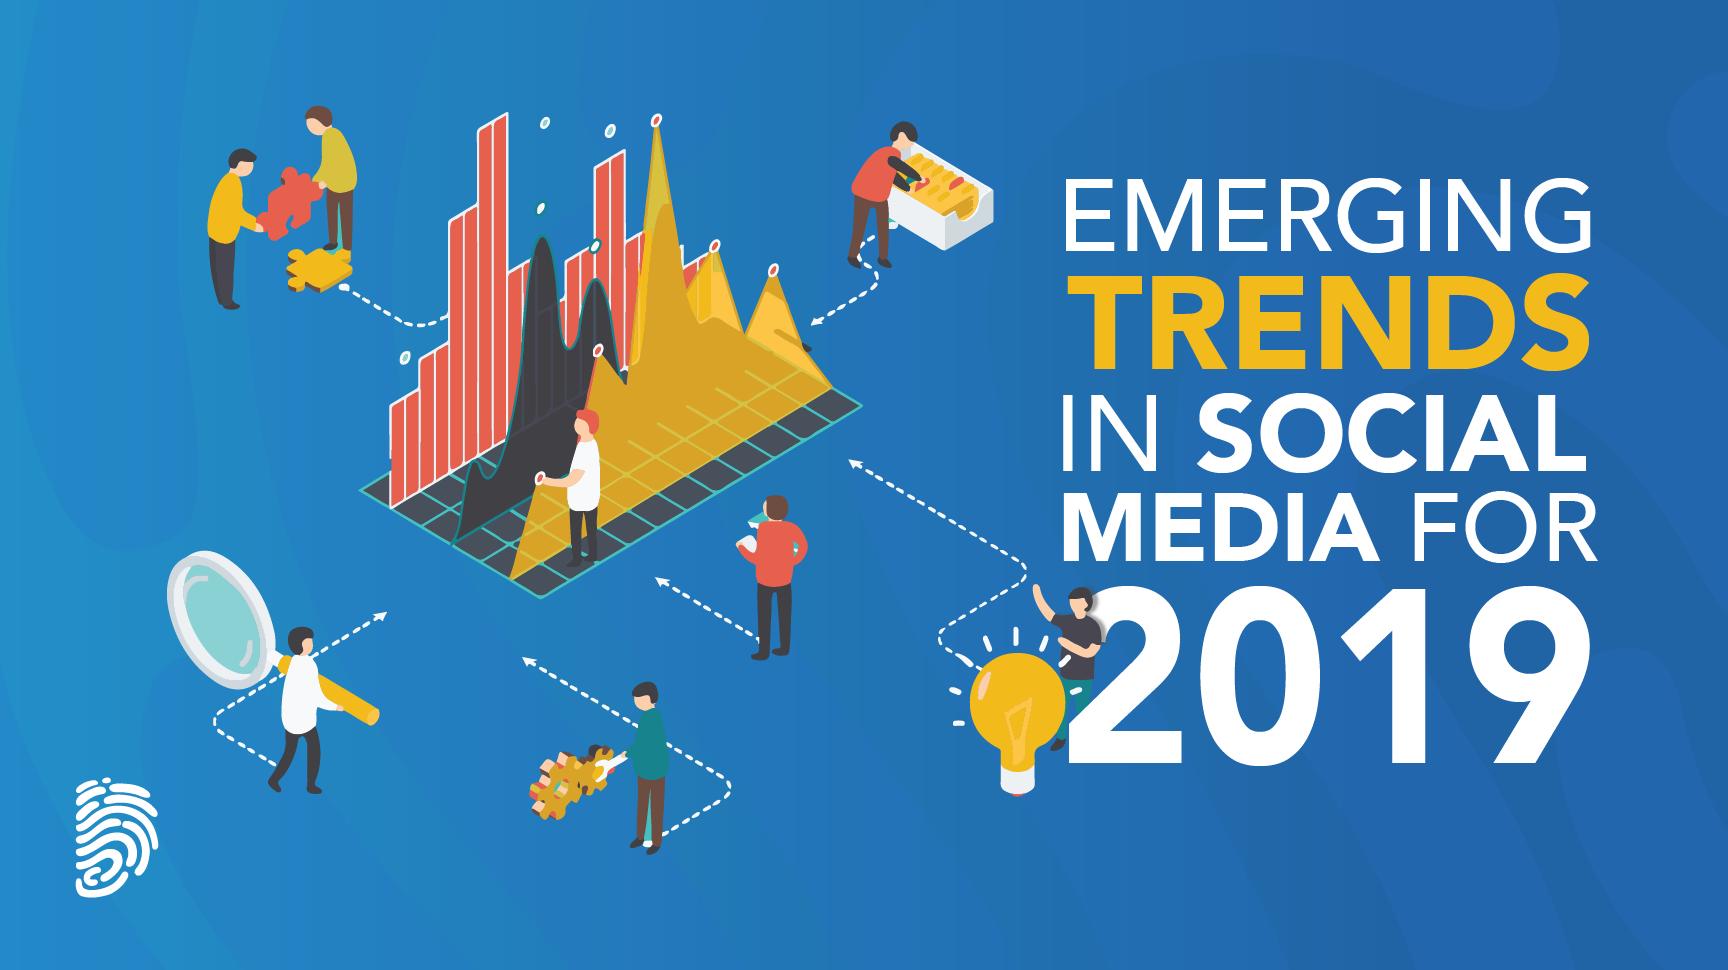 Emerging Trends In Social Media For 2019